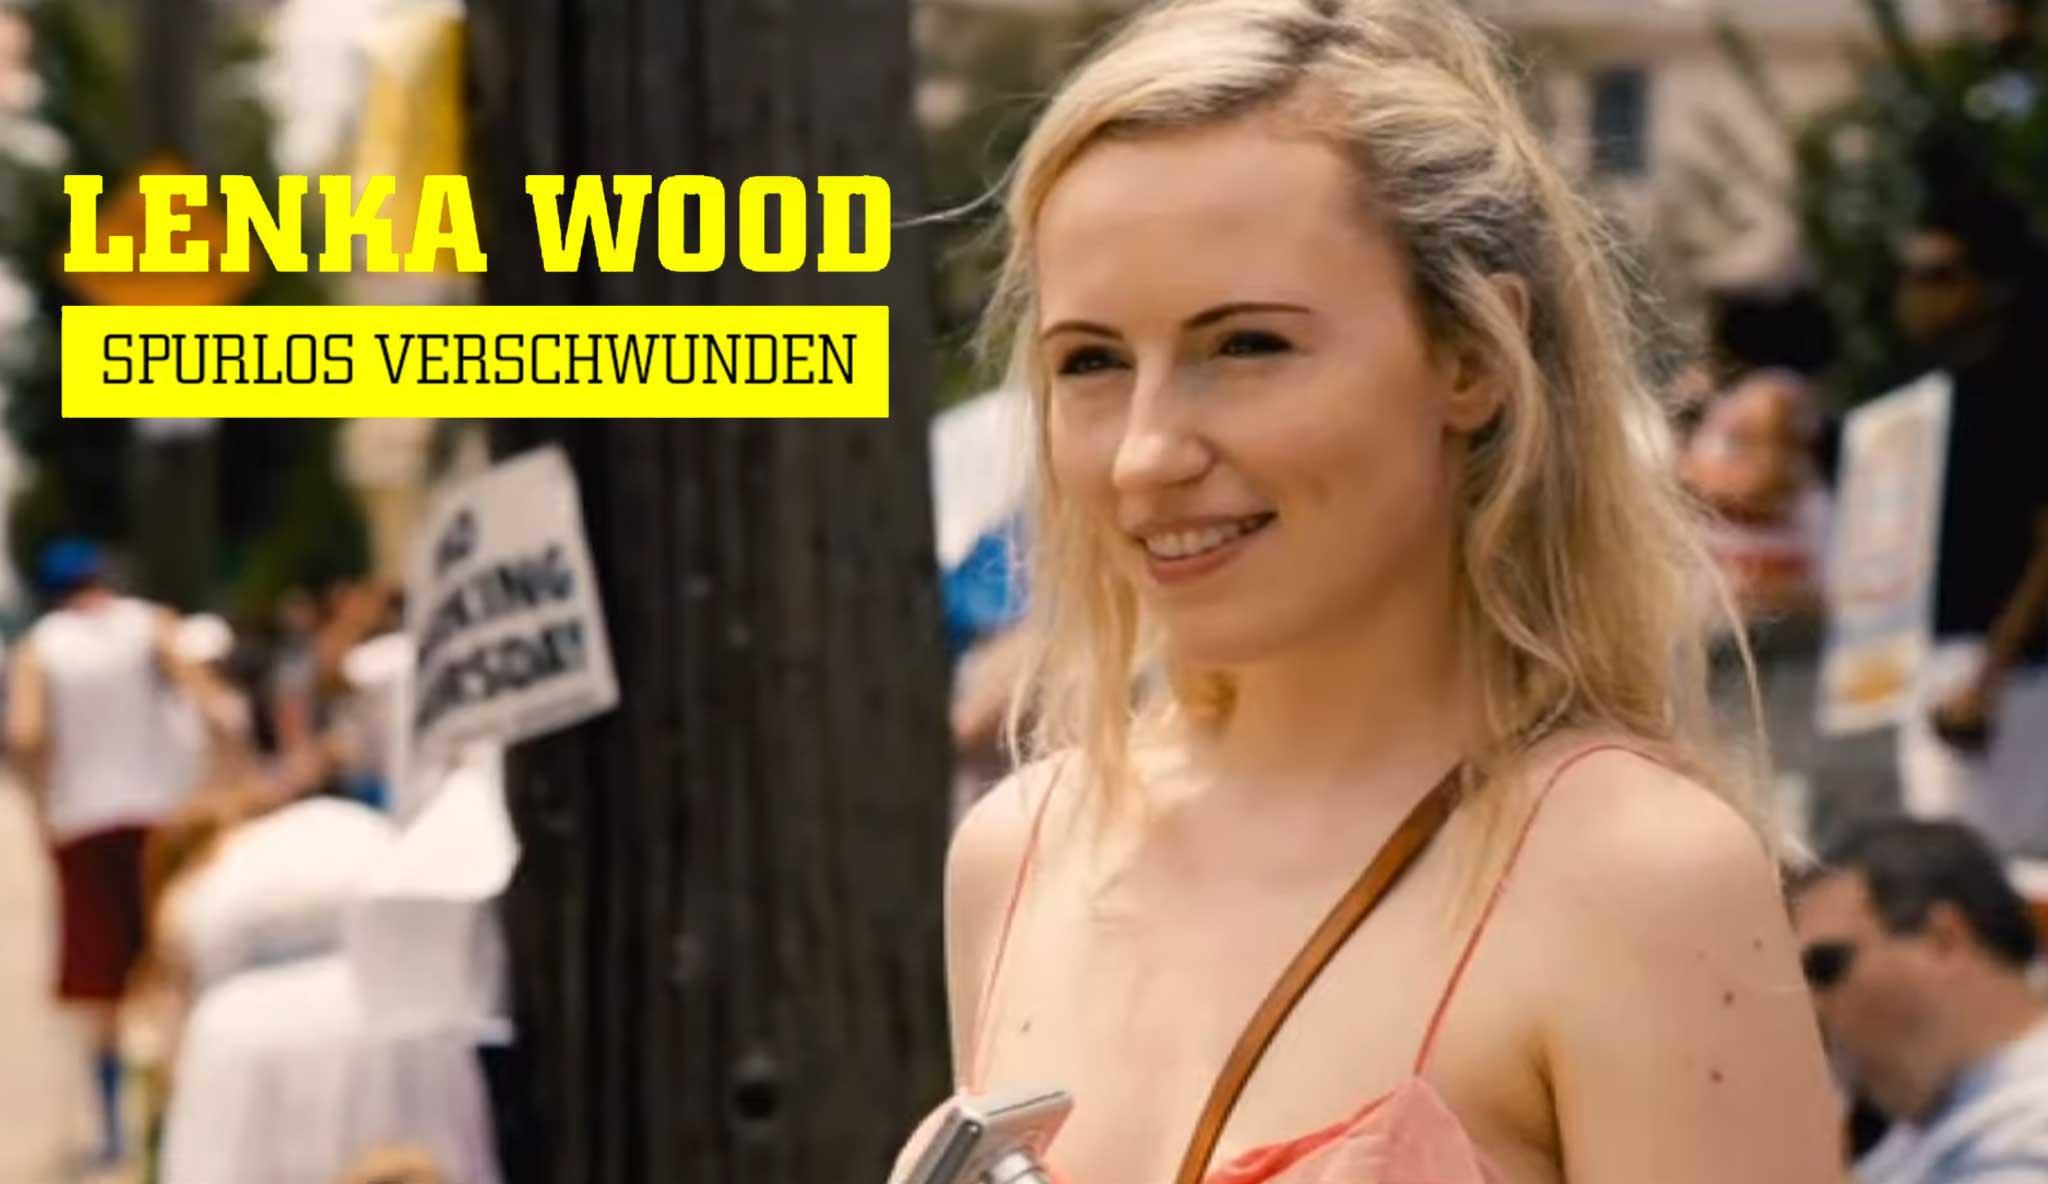 lenka-wood-spurlos-verschwunden\header.jpg